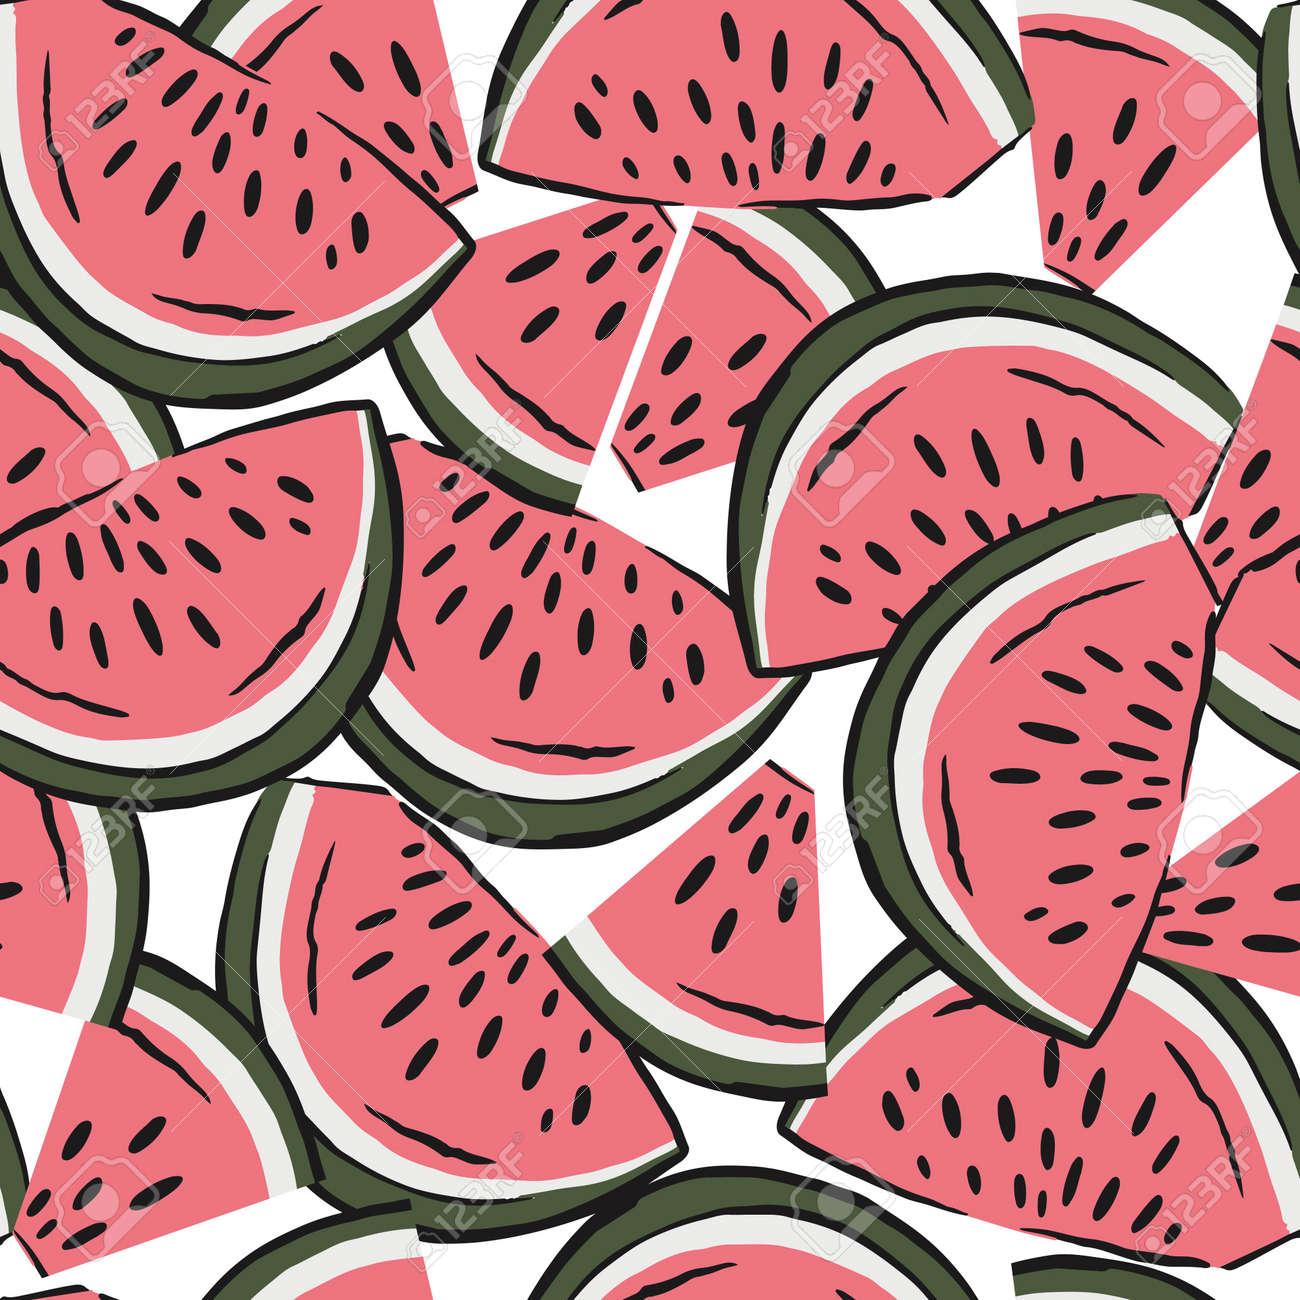 watermelon slices pattern. fruit background. Summer textile print on white background. - 154728209